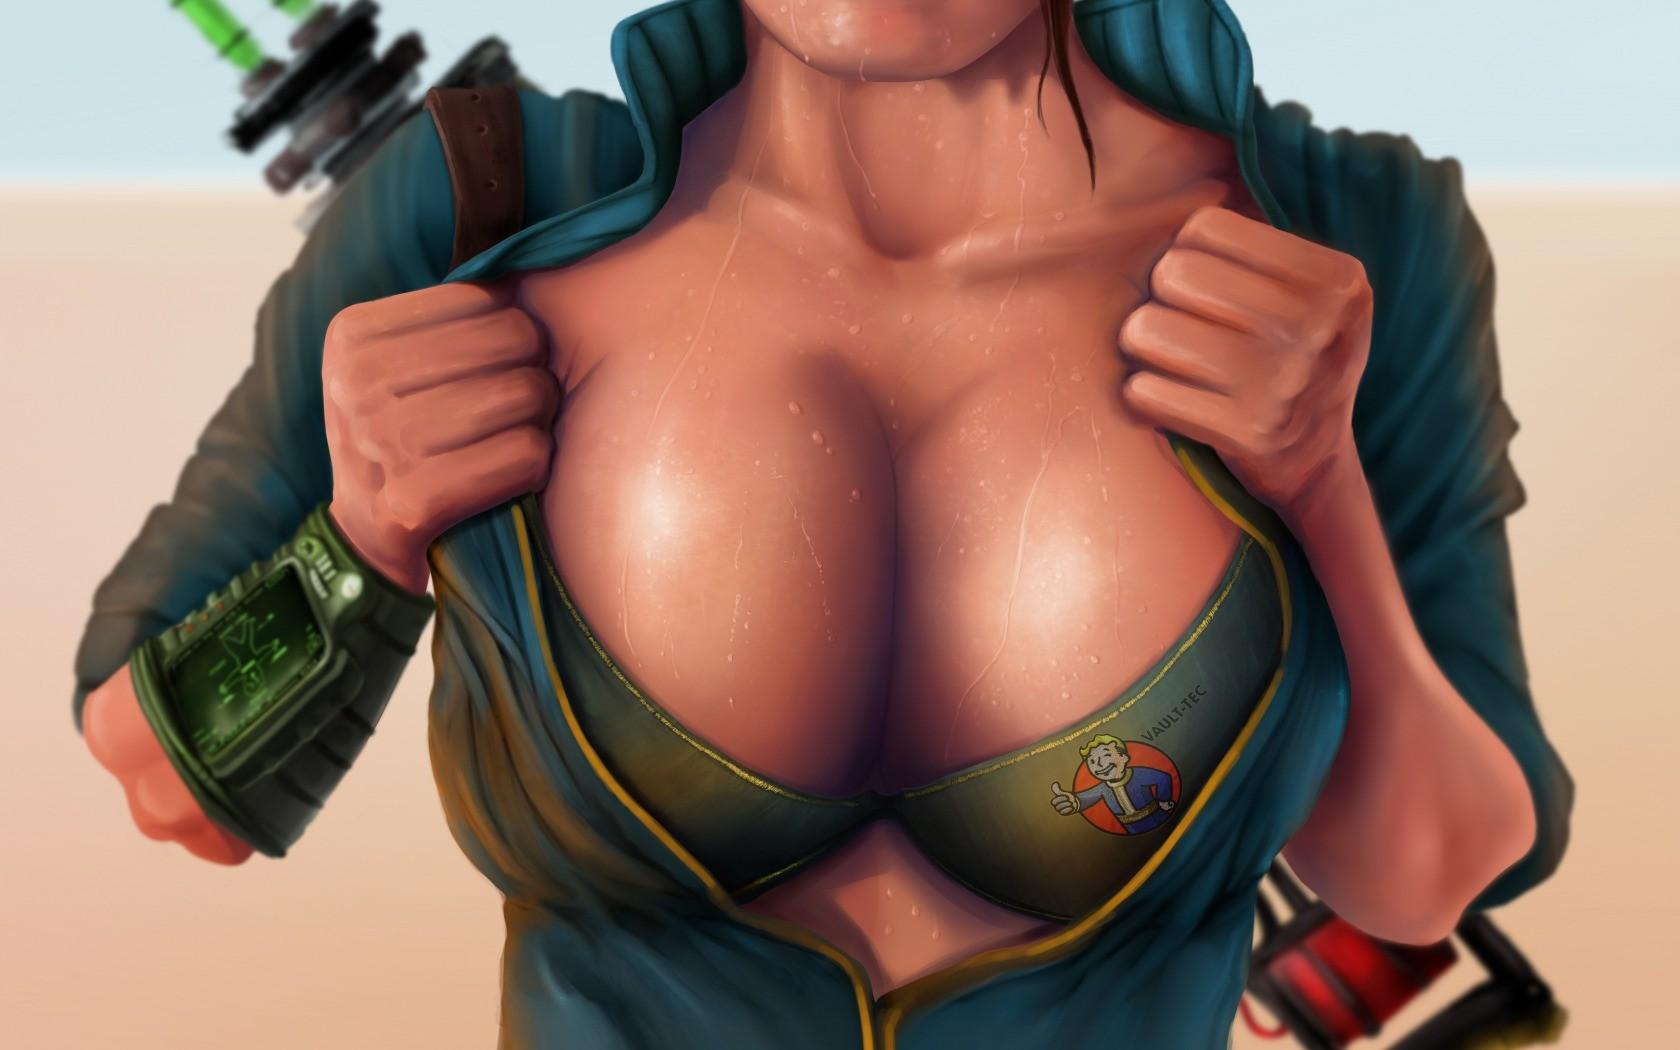 Fallout big tits really. happens